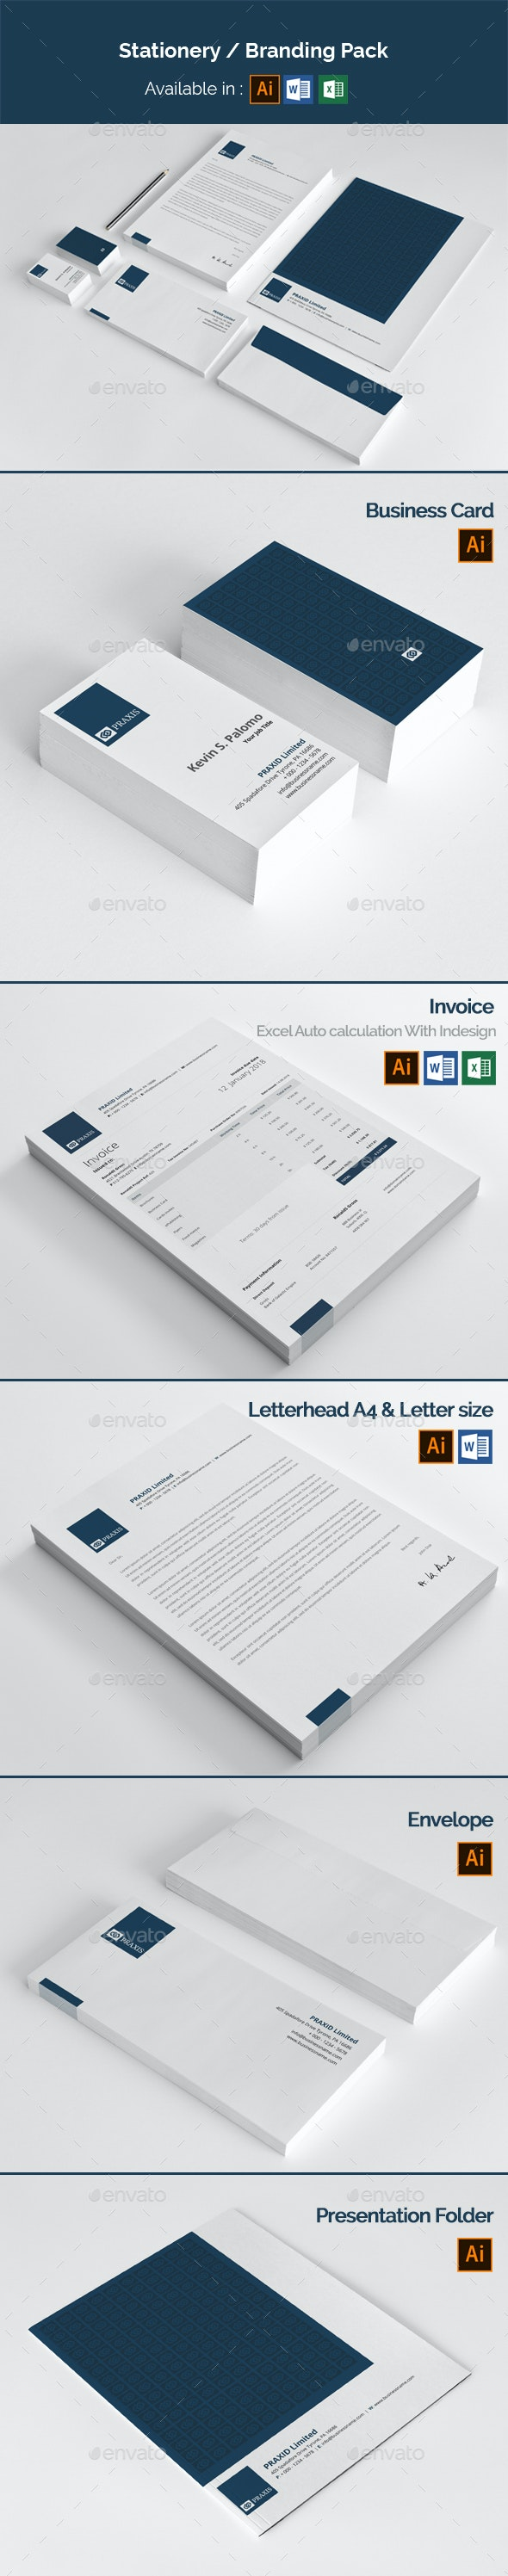 Stationery Branding Pack - Stationery Print Templates